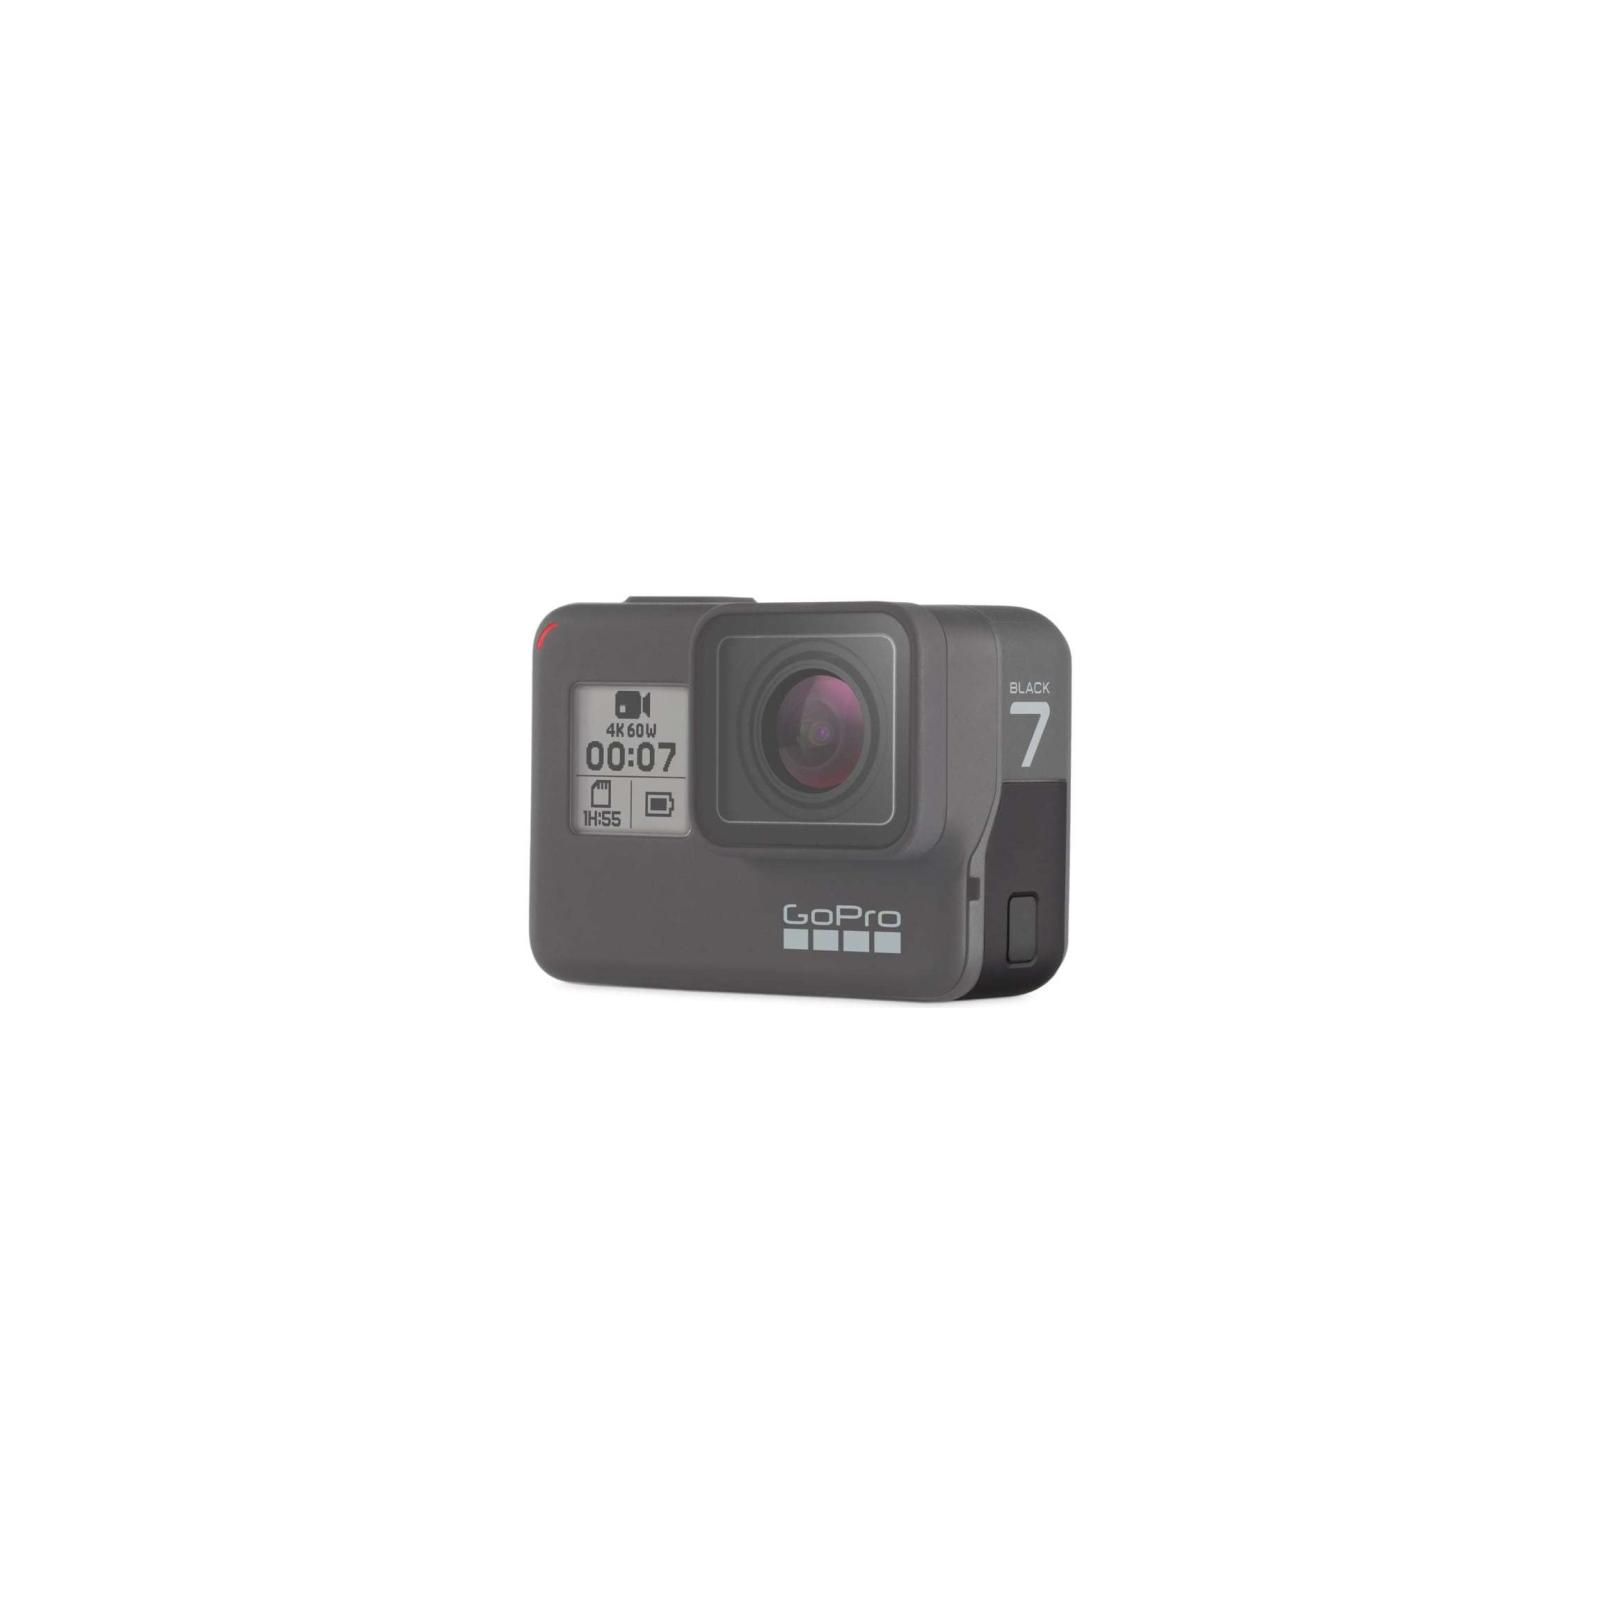 Аксессуар к экшн-камерам GoPro Replacement Door HERO7 Black (AAIOD-003)